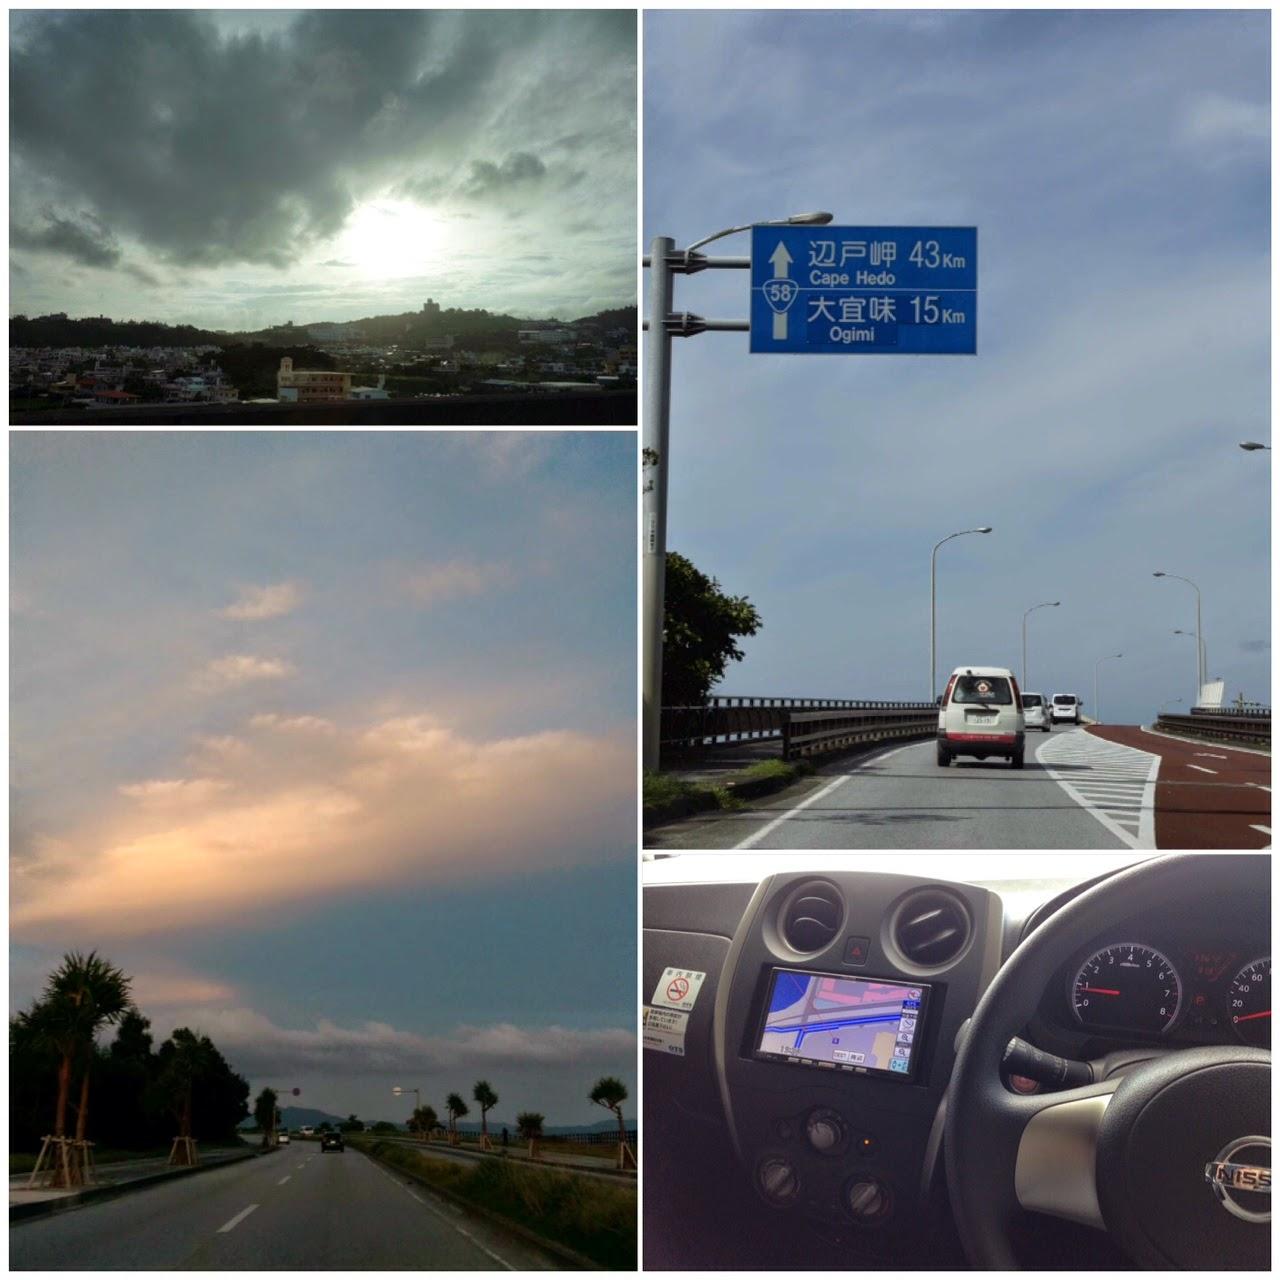 gladysliu: 沖繩自駕遊2014 Monterey Vacation(02)~OTS租車篇,租Pocket Wi-Fi篇